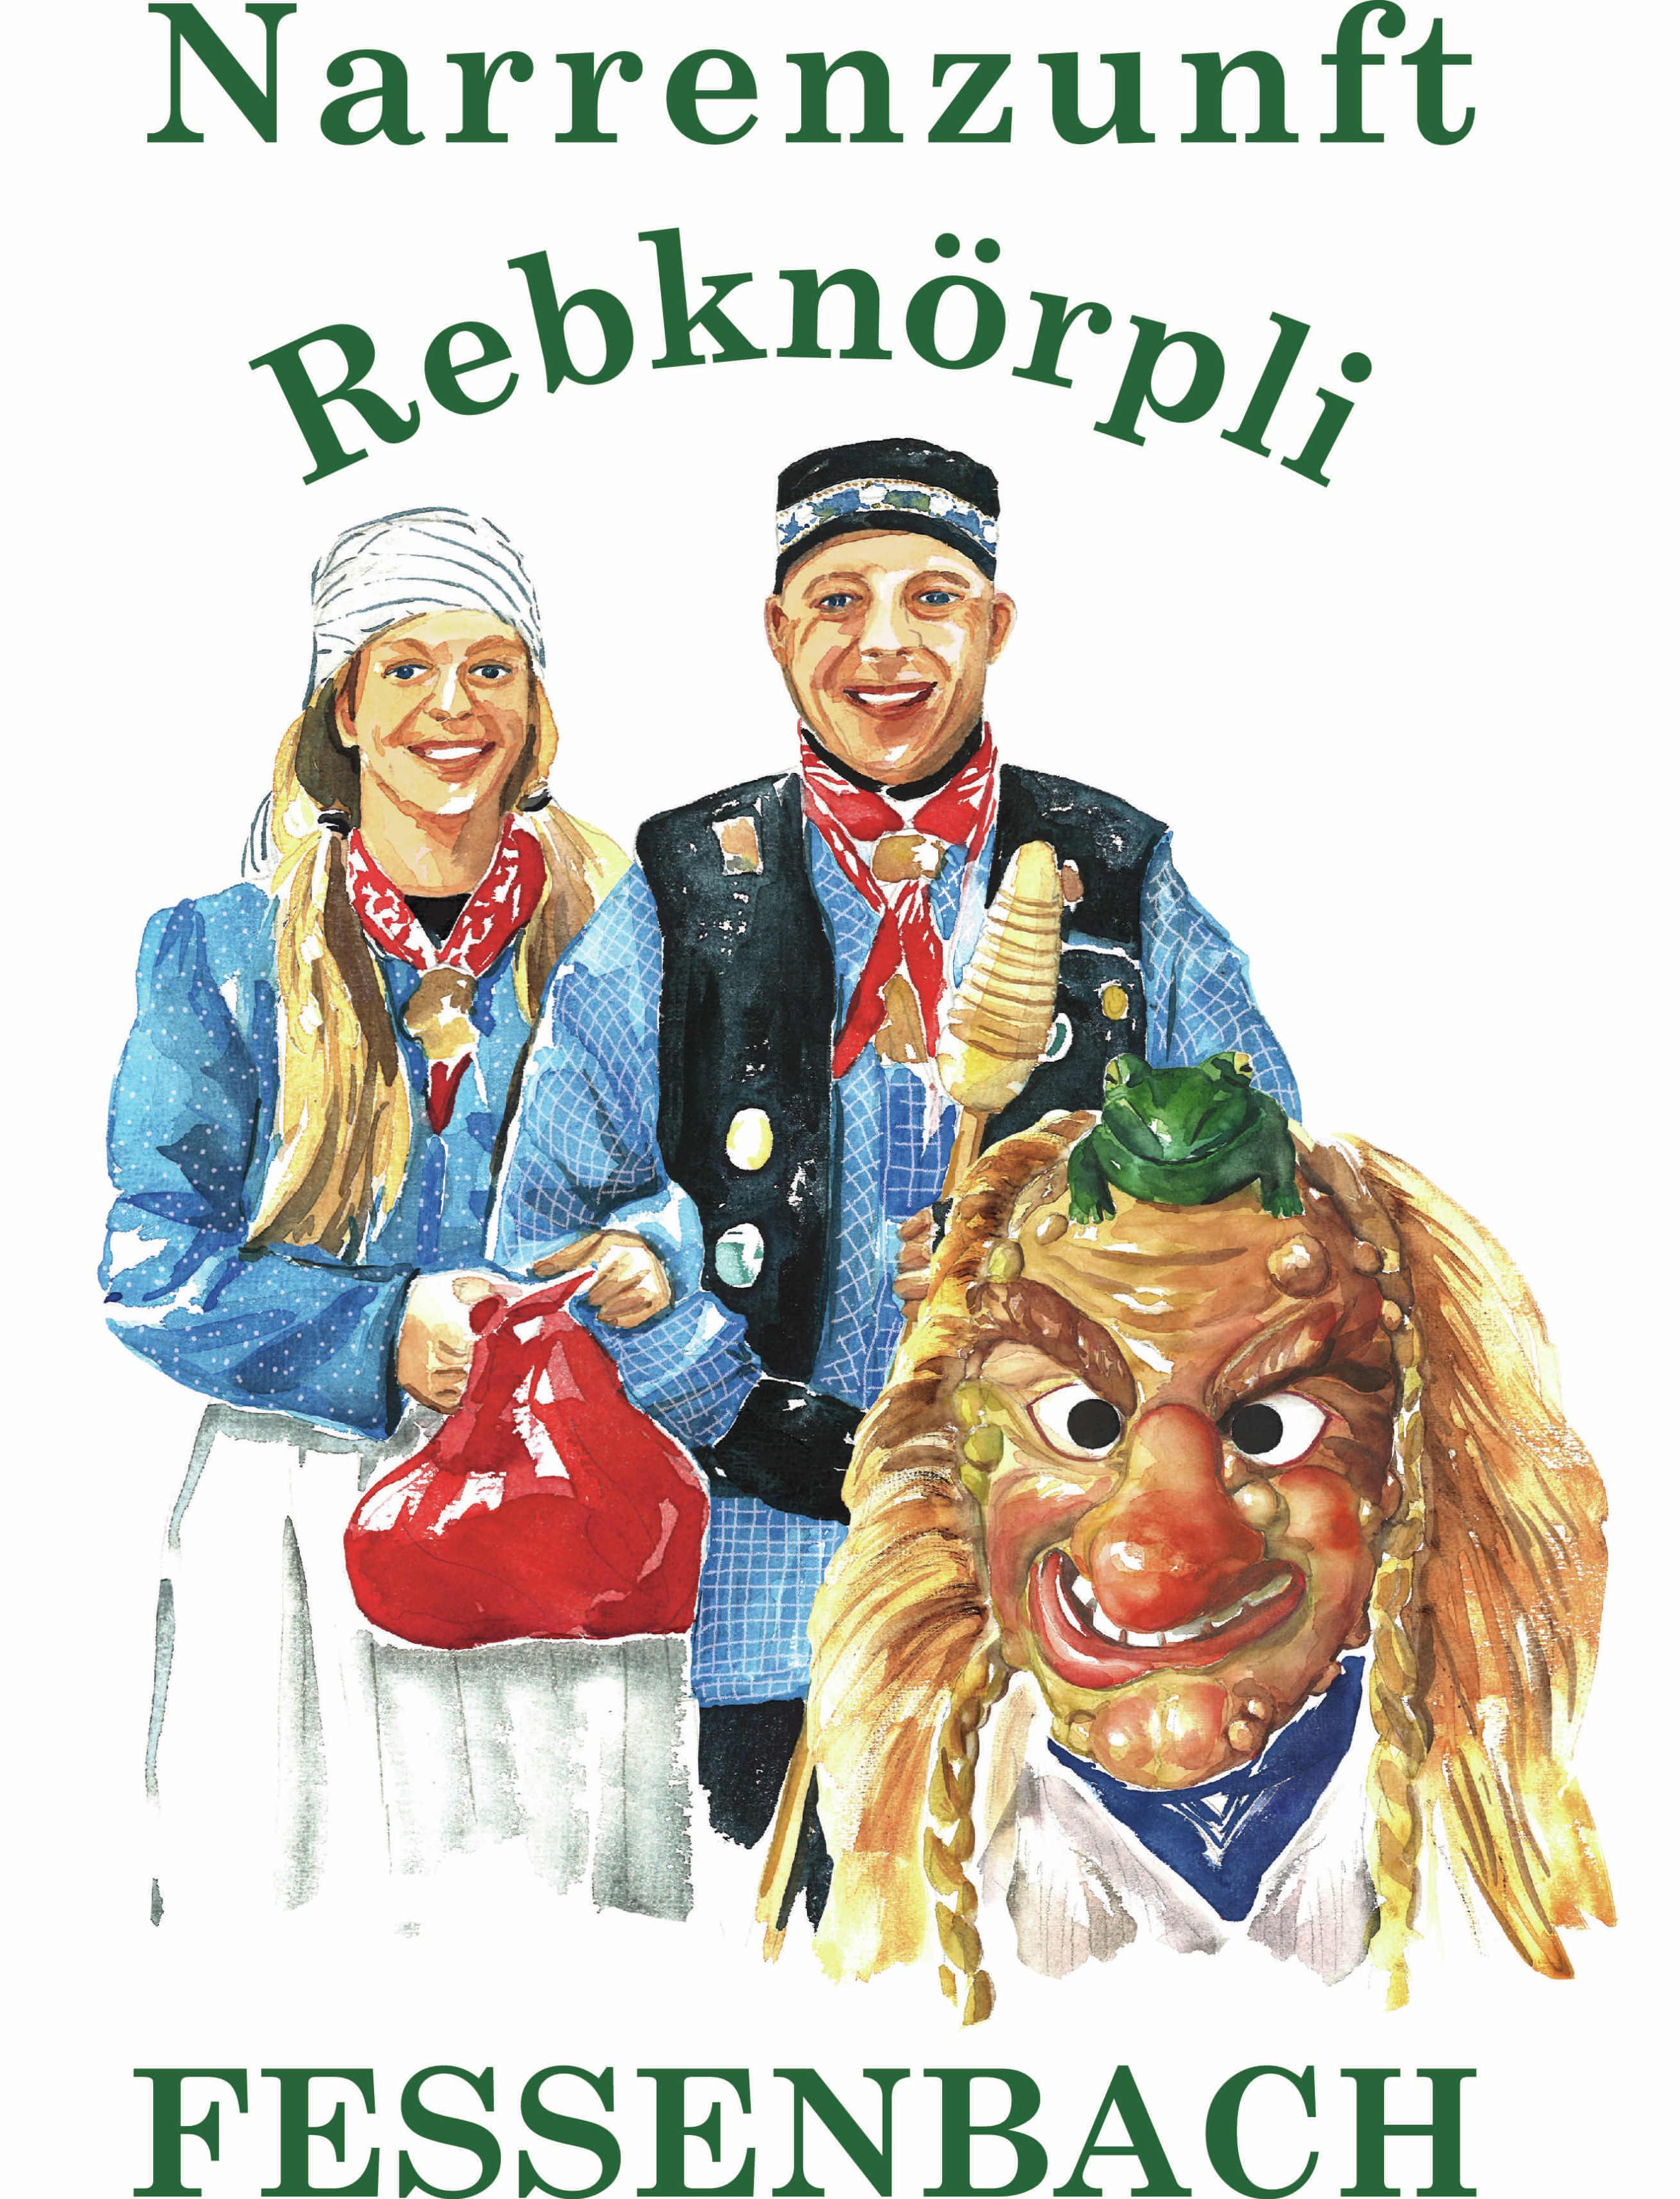 Narrenzunft 'Rebknörpli' Fessenbach